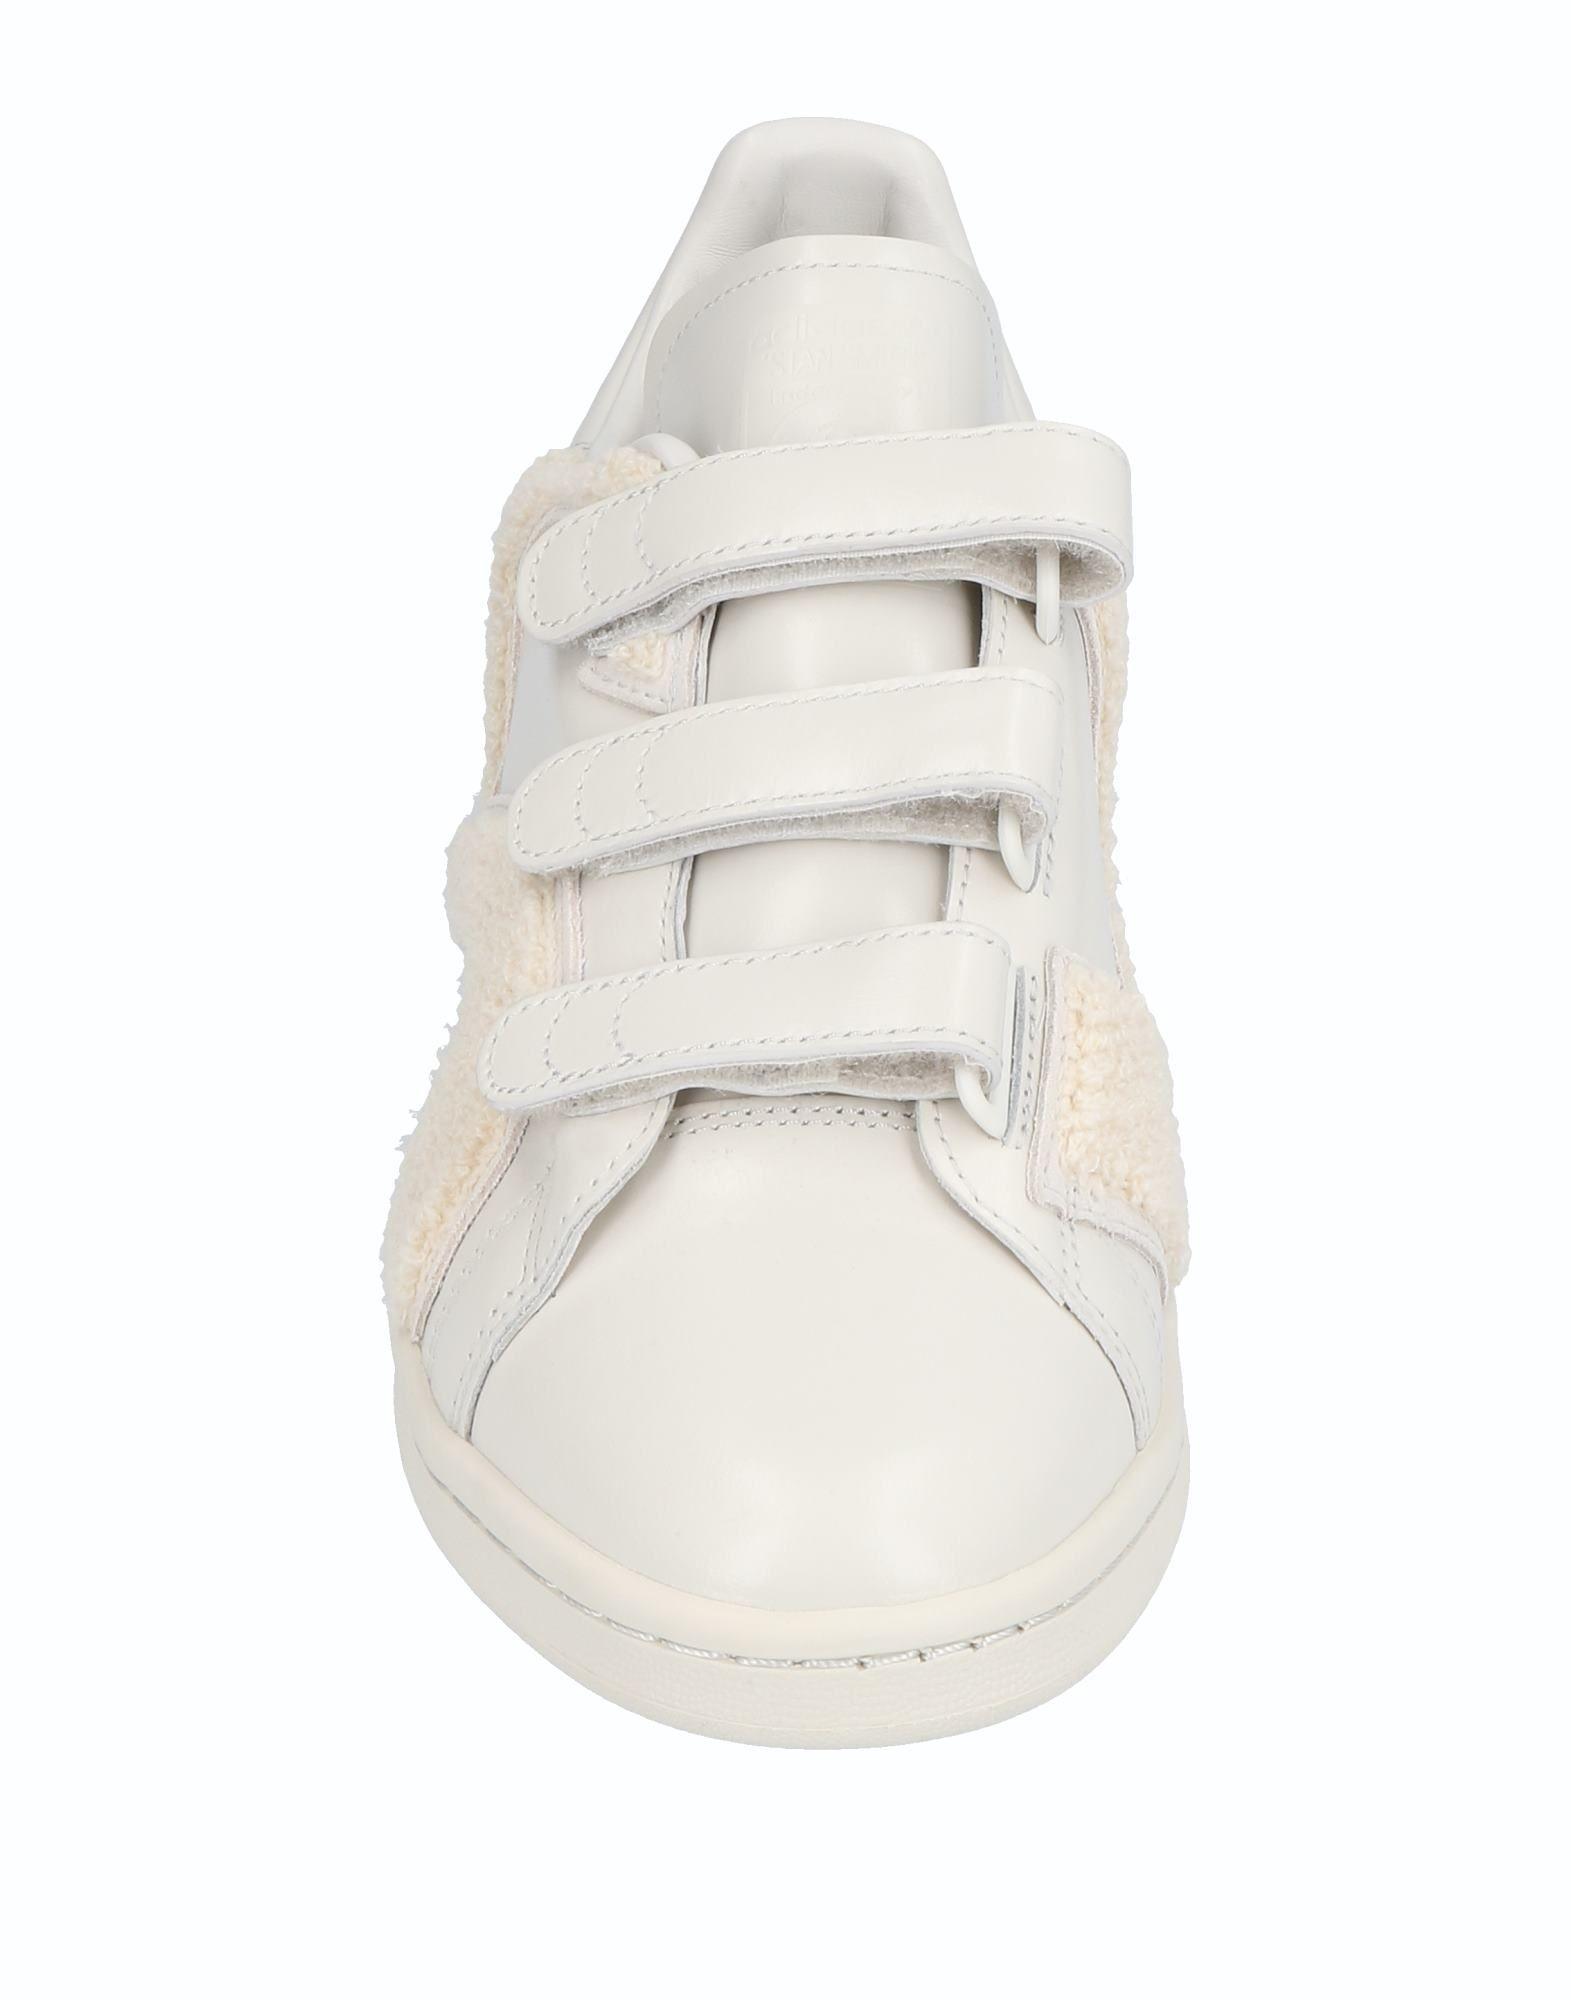 Adidas es By Raf Simons Sneakers Herren Gutes Preis-Leistungs-Verhältnis, es Adidas lohnt sich e6d779